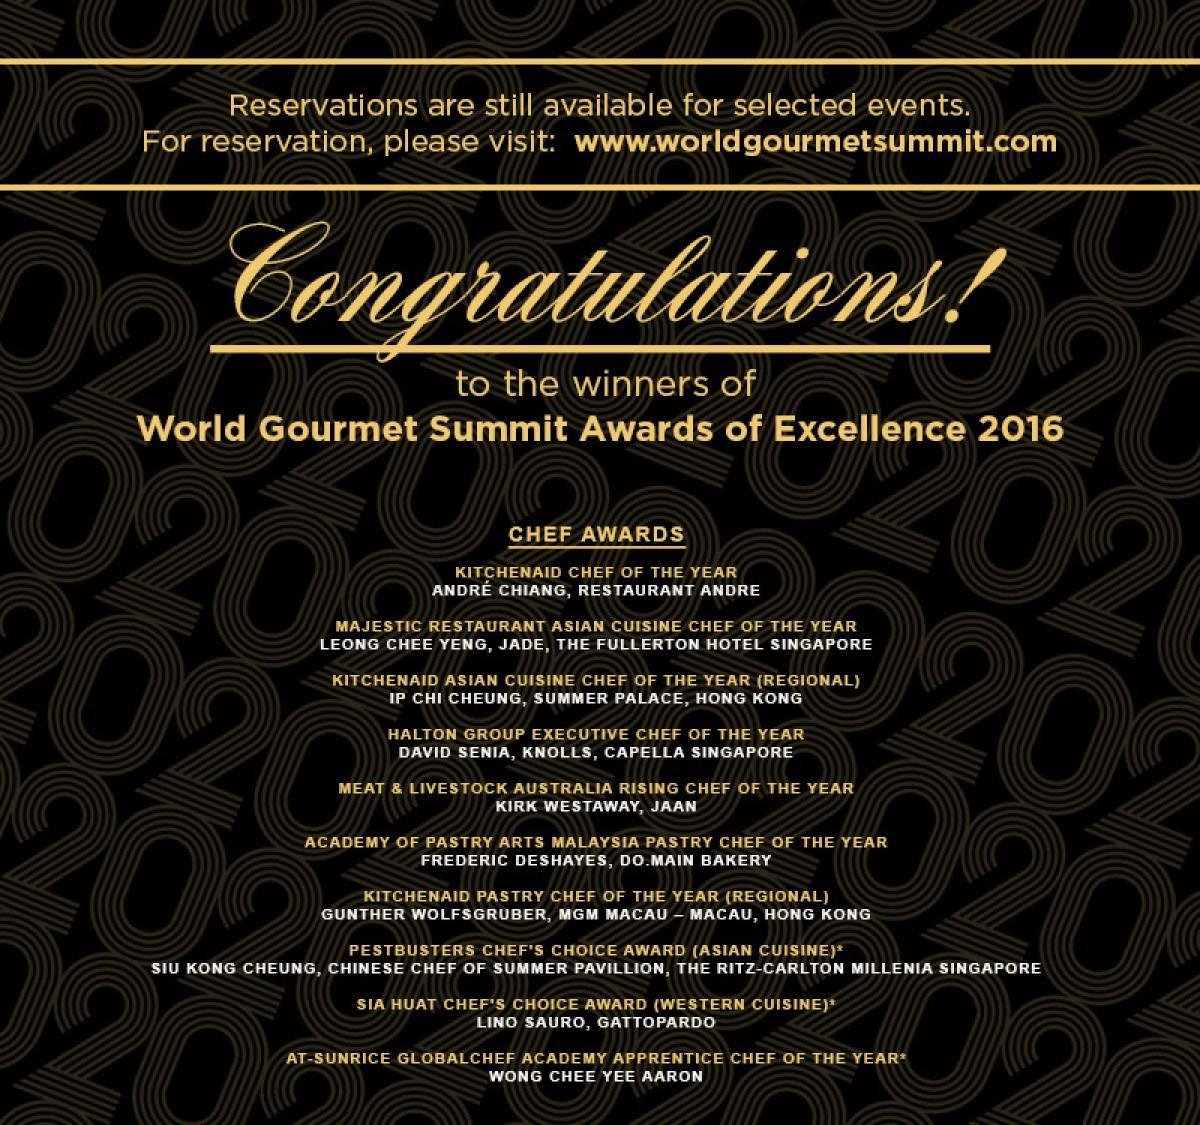 WORLD GOURMET SUMMIT CELEBRATES 20th YEAR MILESTONE